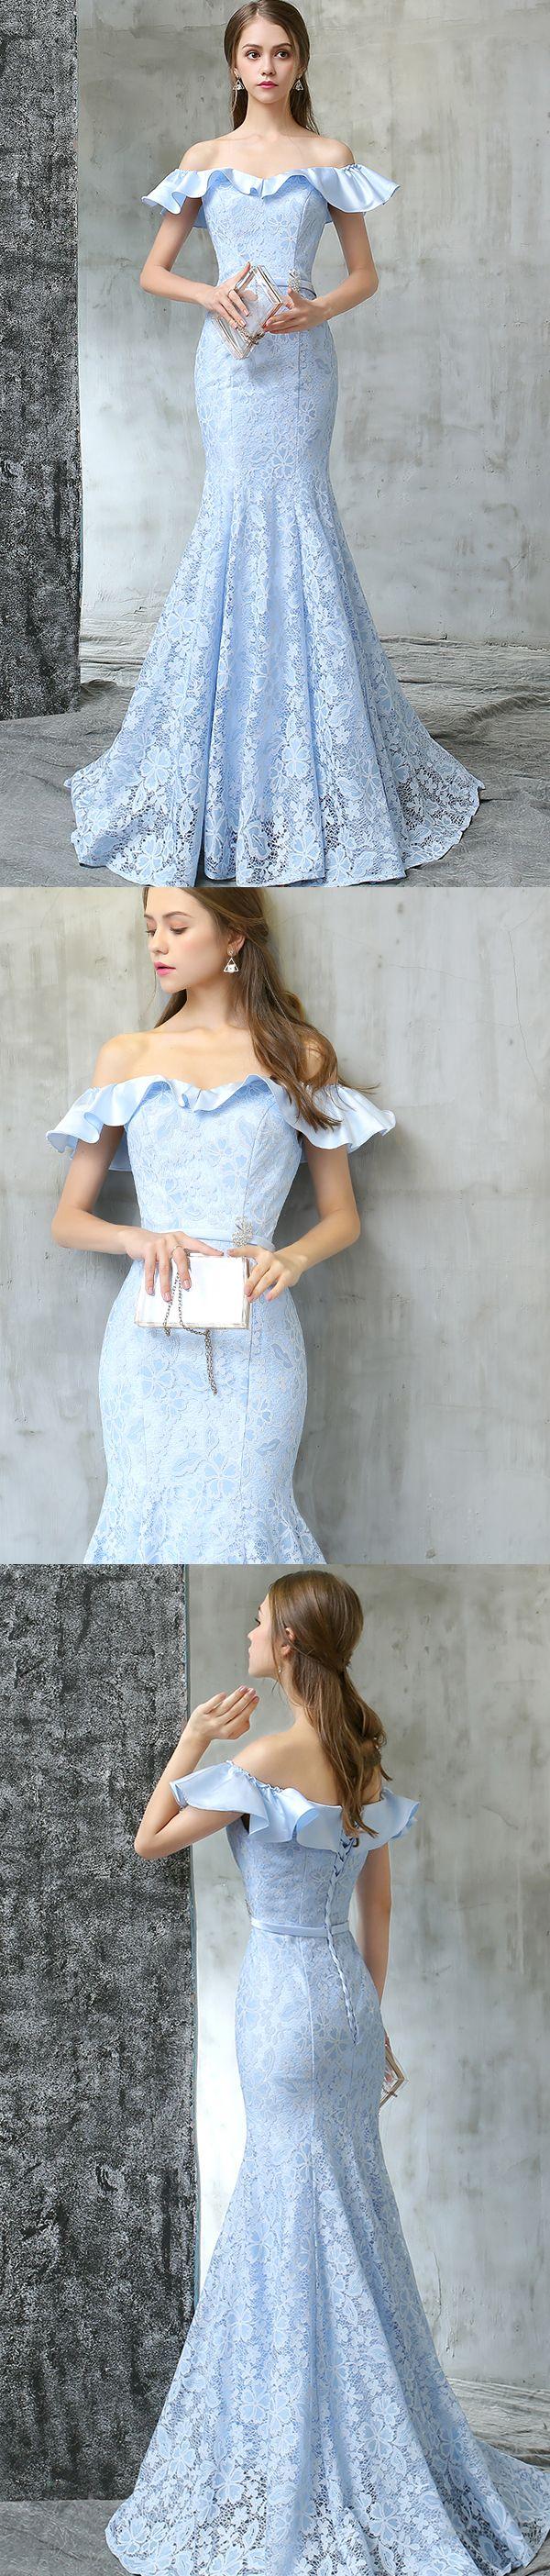 Long prom dress off shoulder prom dress mermaid prom dress lace